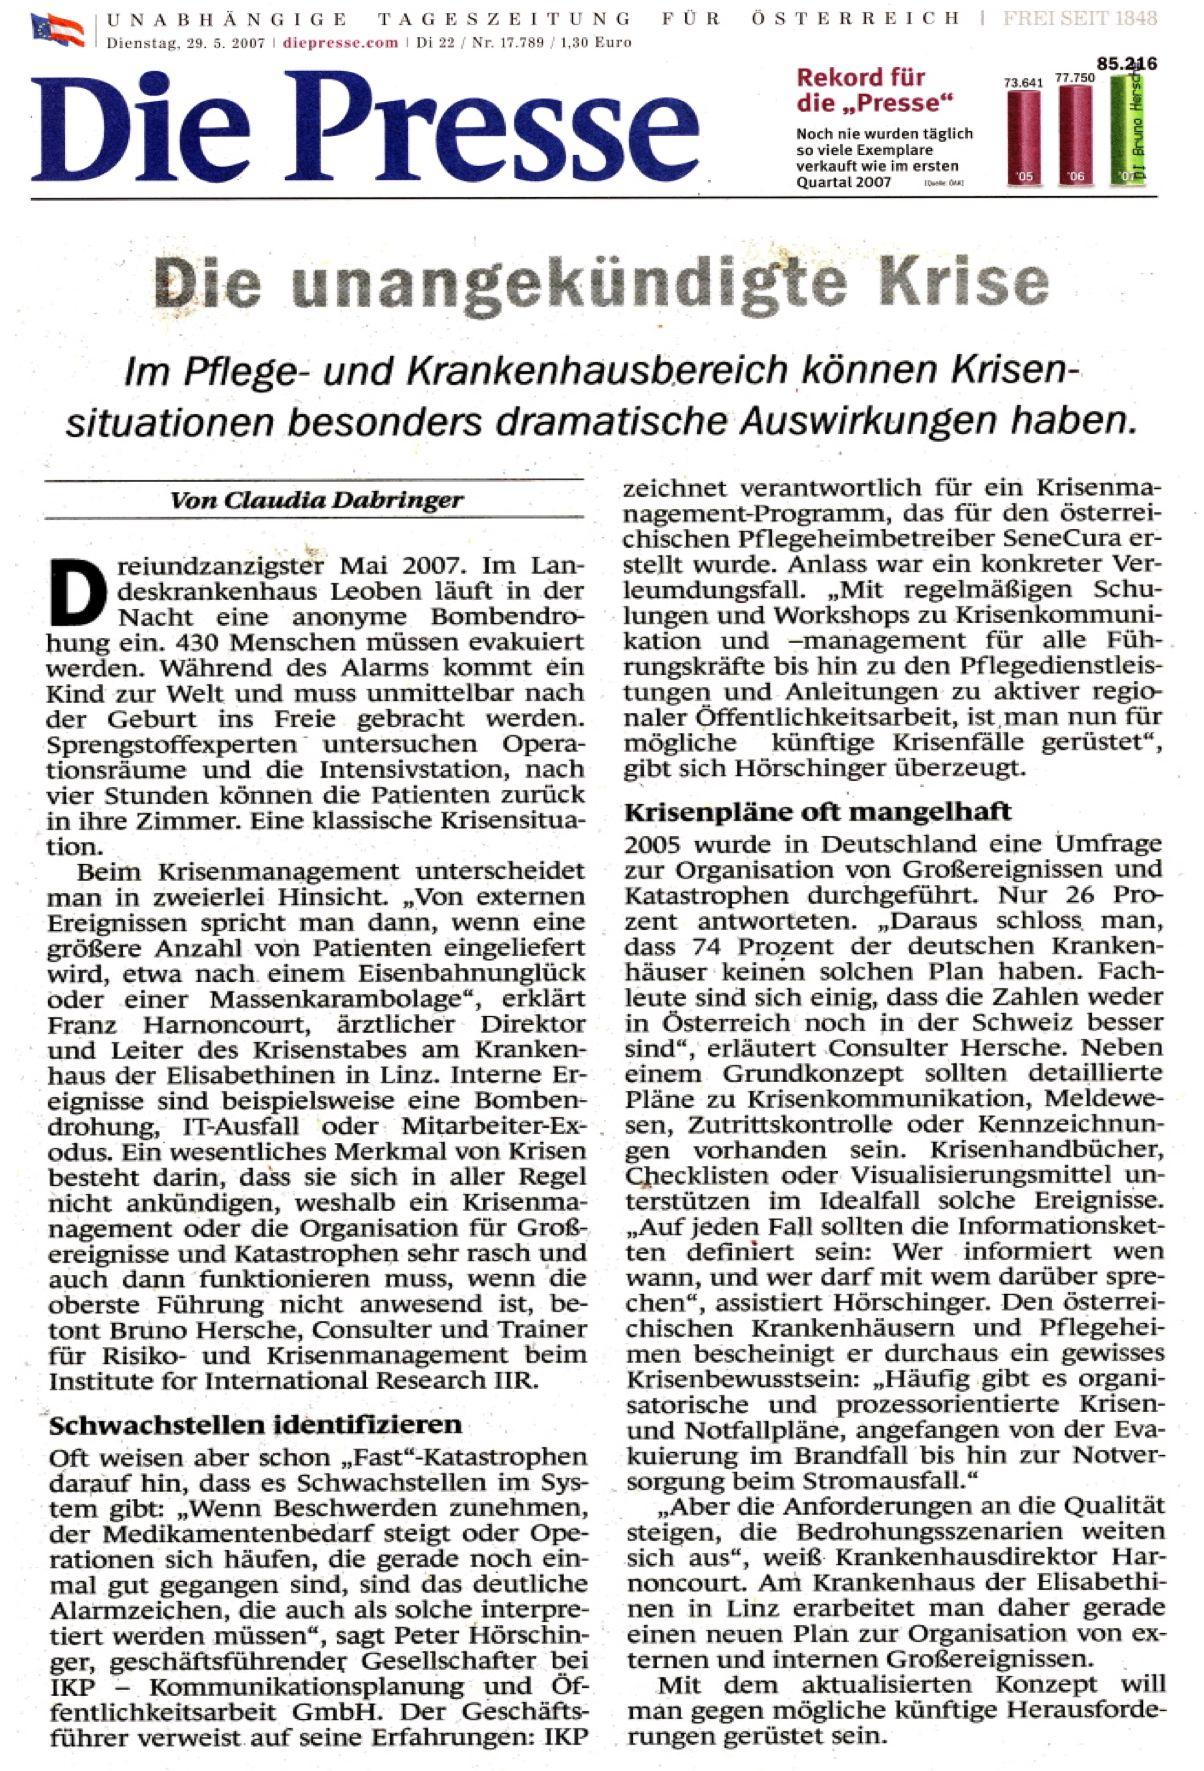 Die Presse Krima Kh